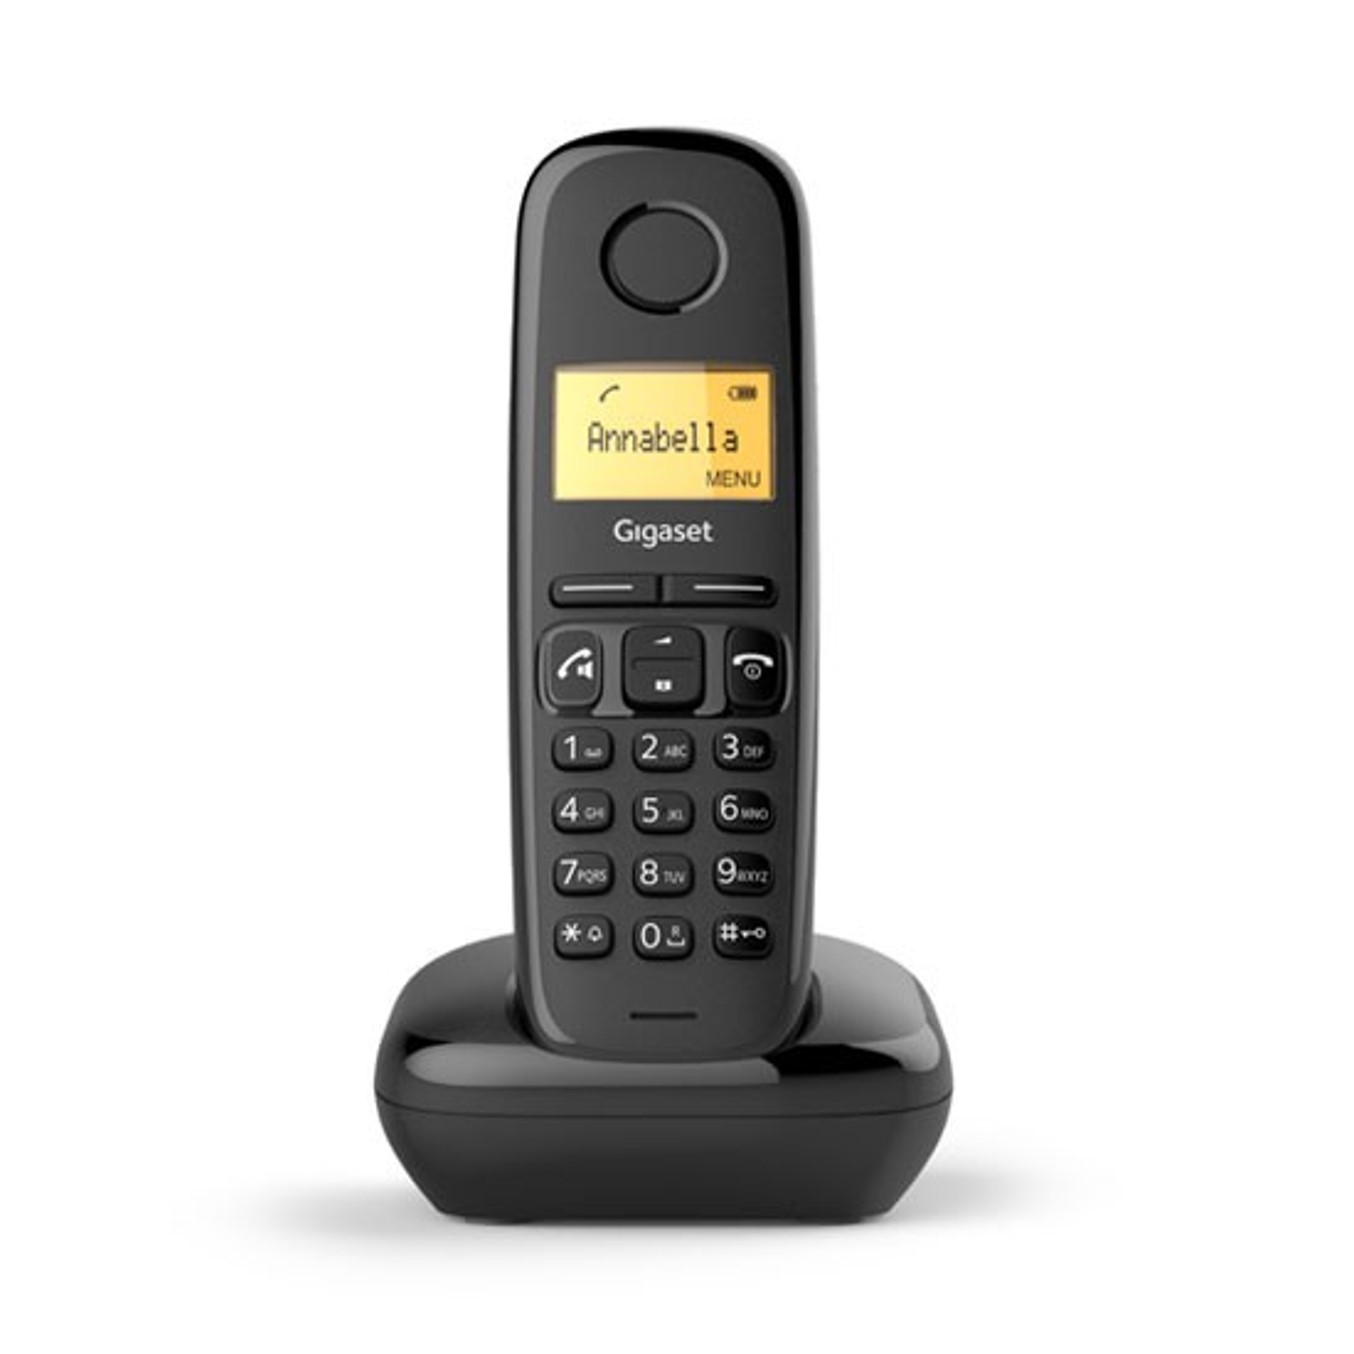 Telefono fijo inalambrico gigaset a270 negro 80 numeros agenda -  10 tonos